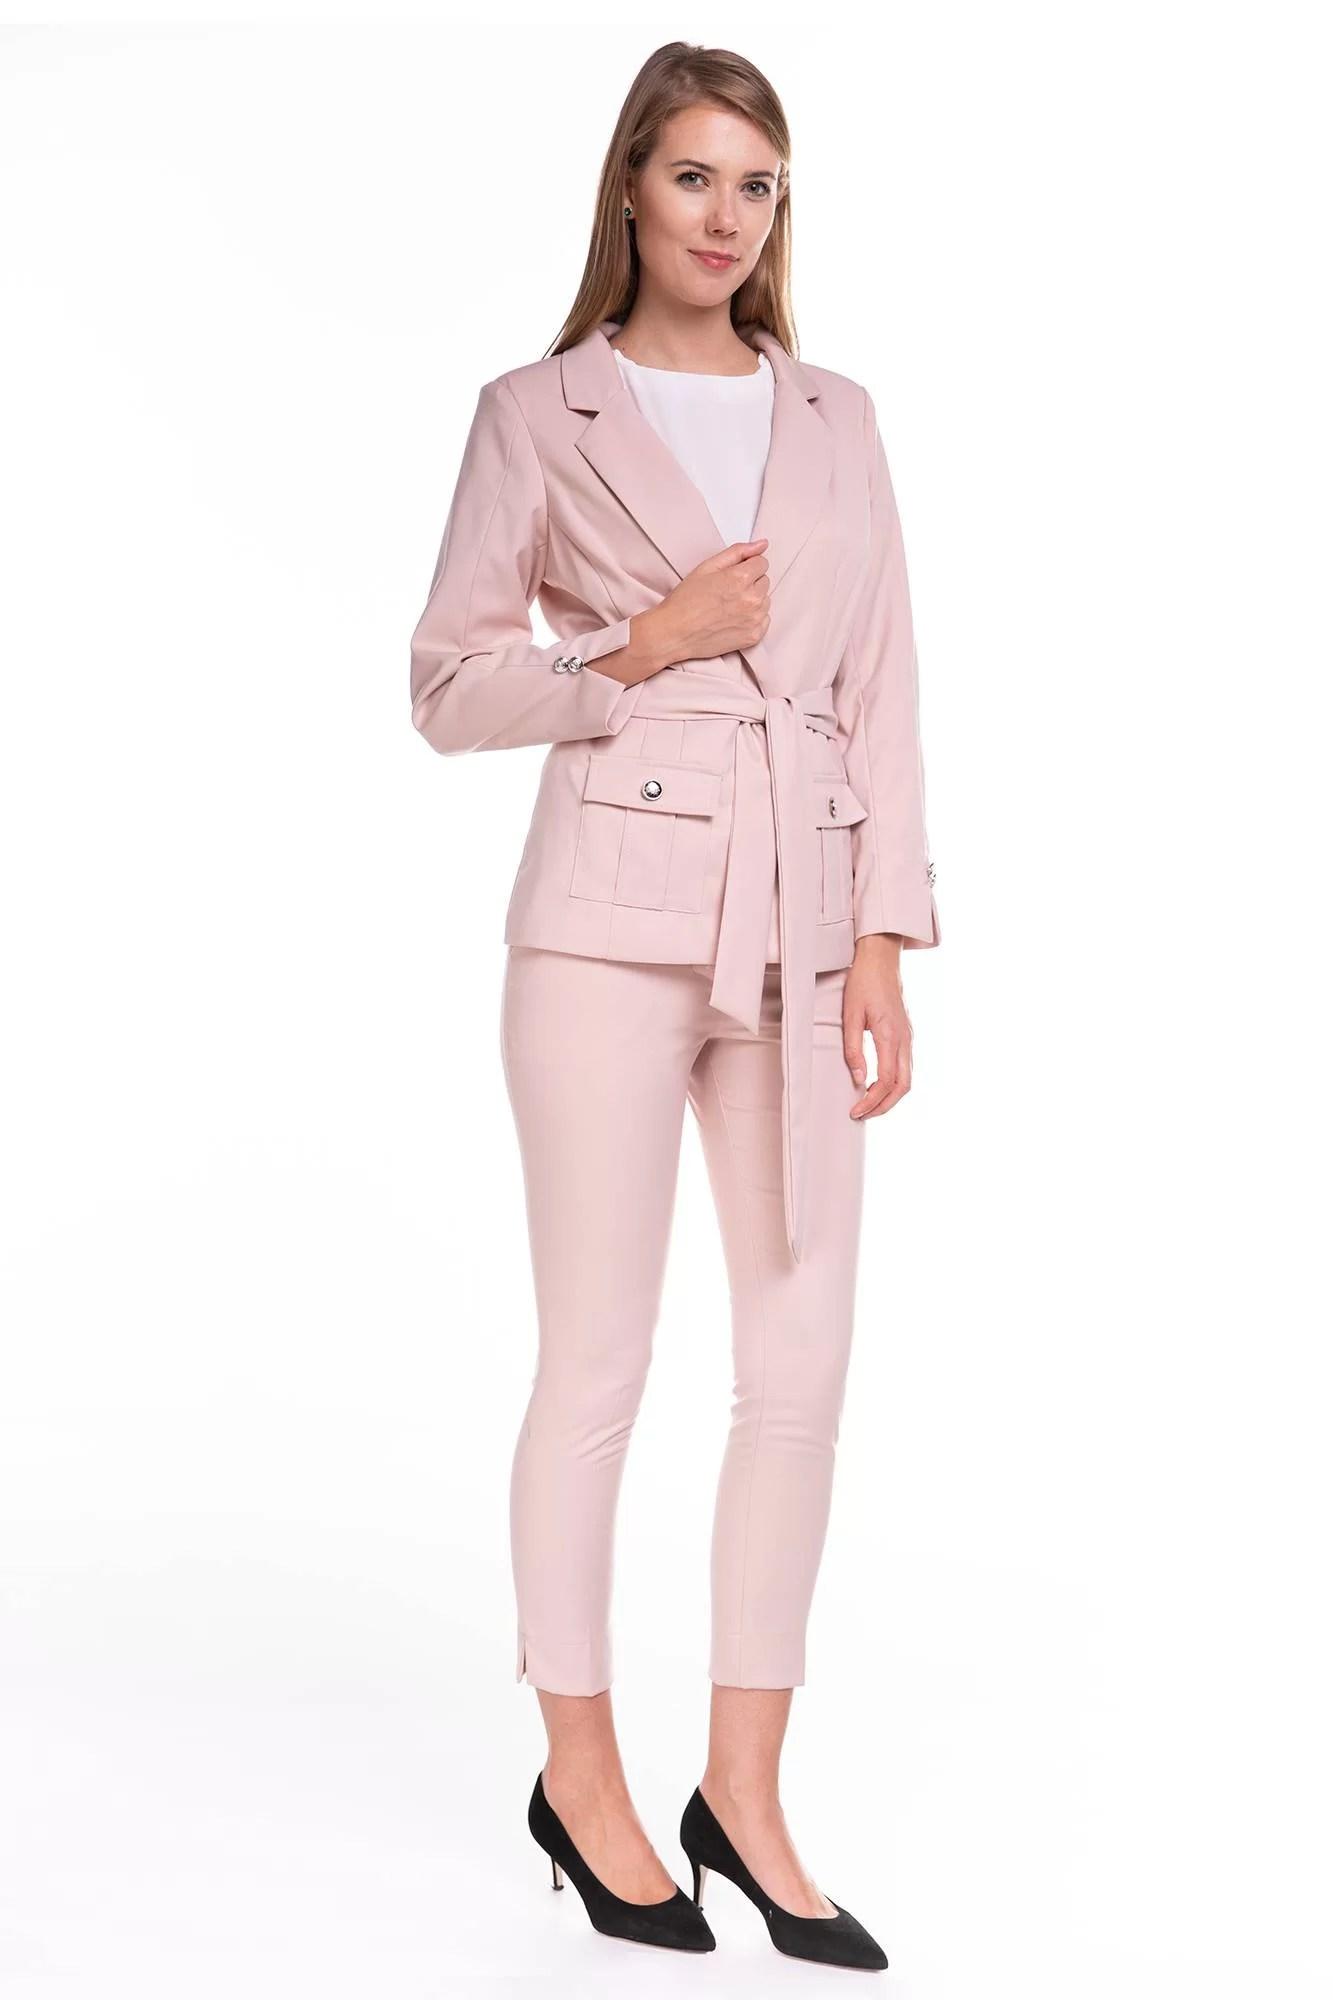 Komplet Glamour Jasny roz